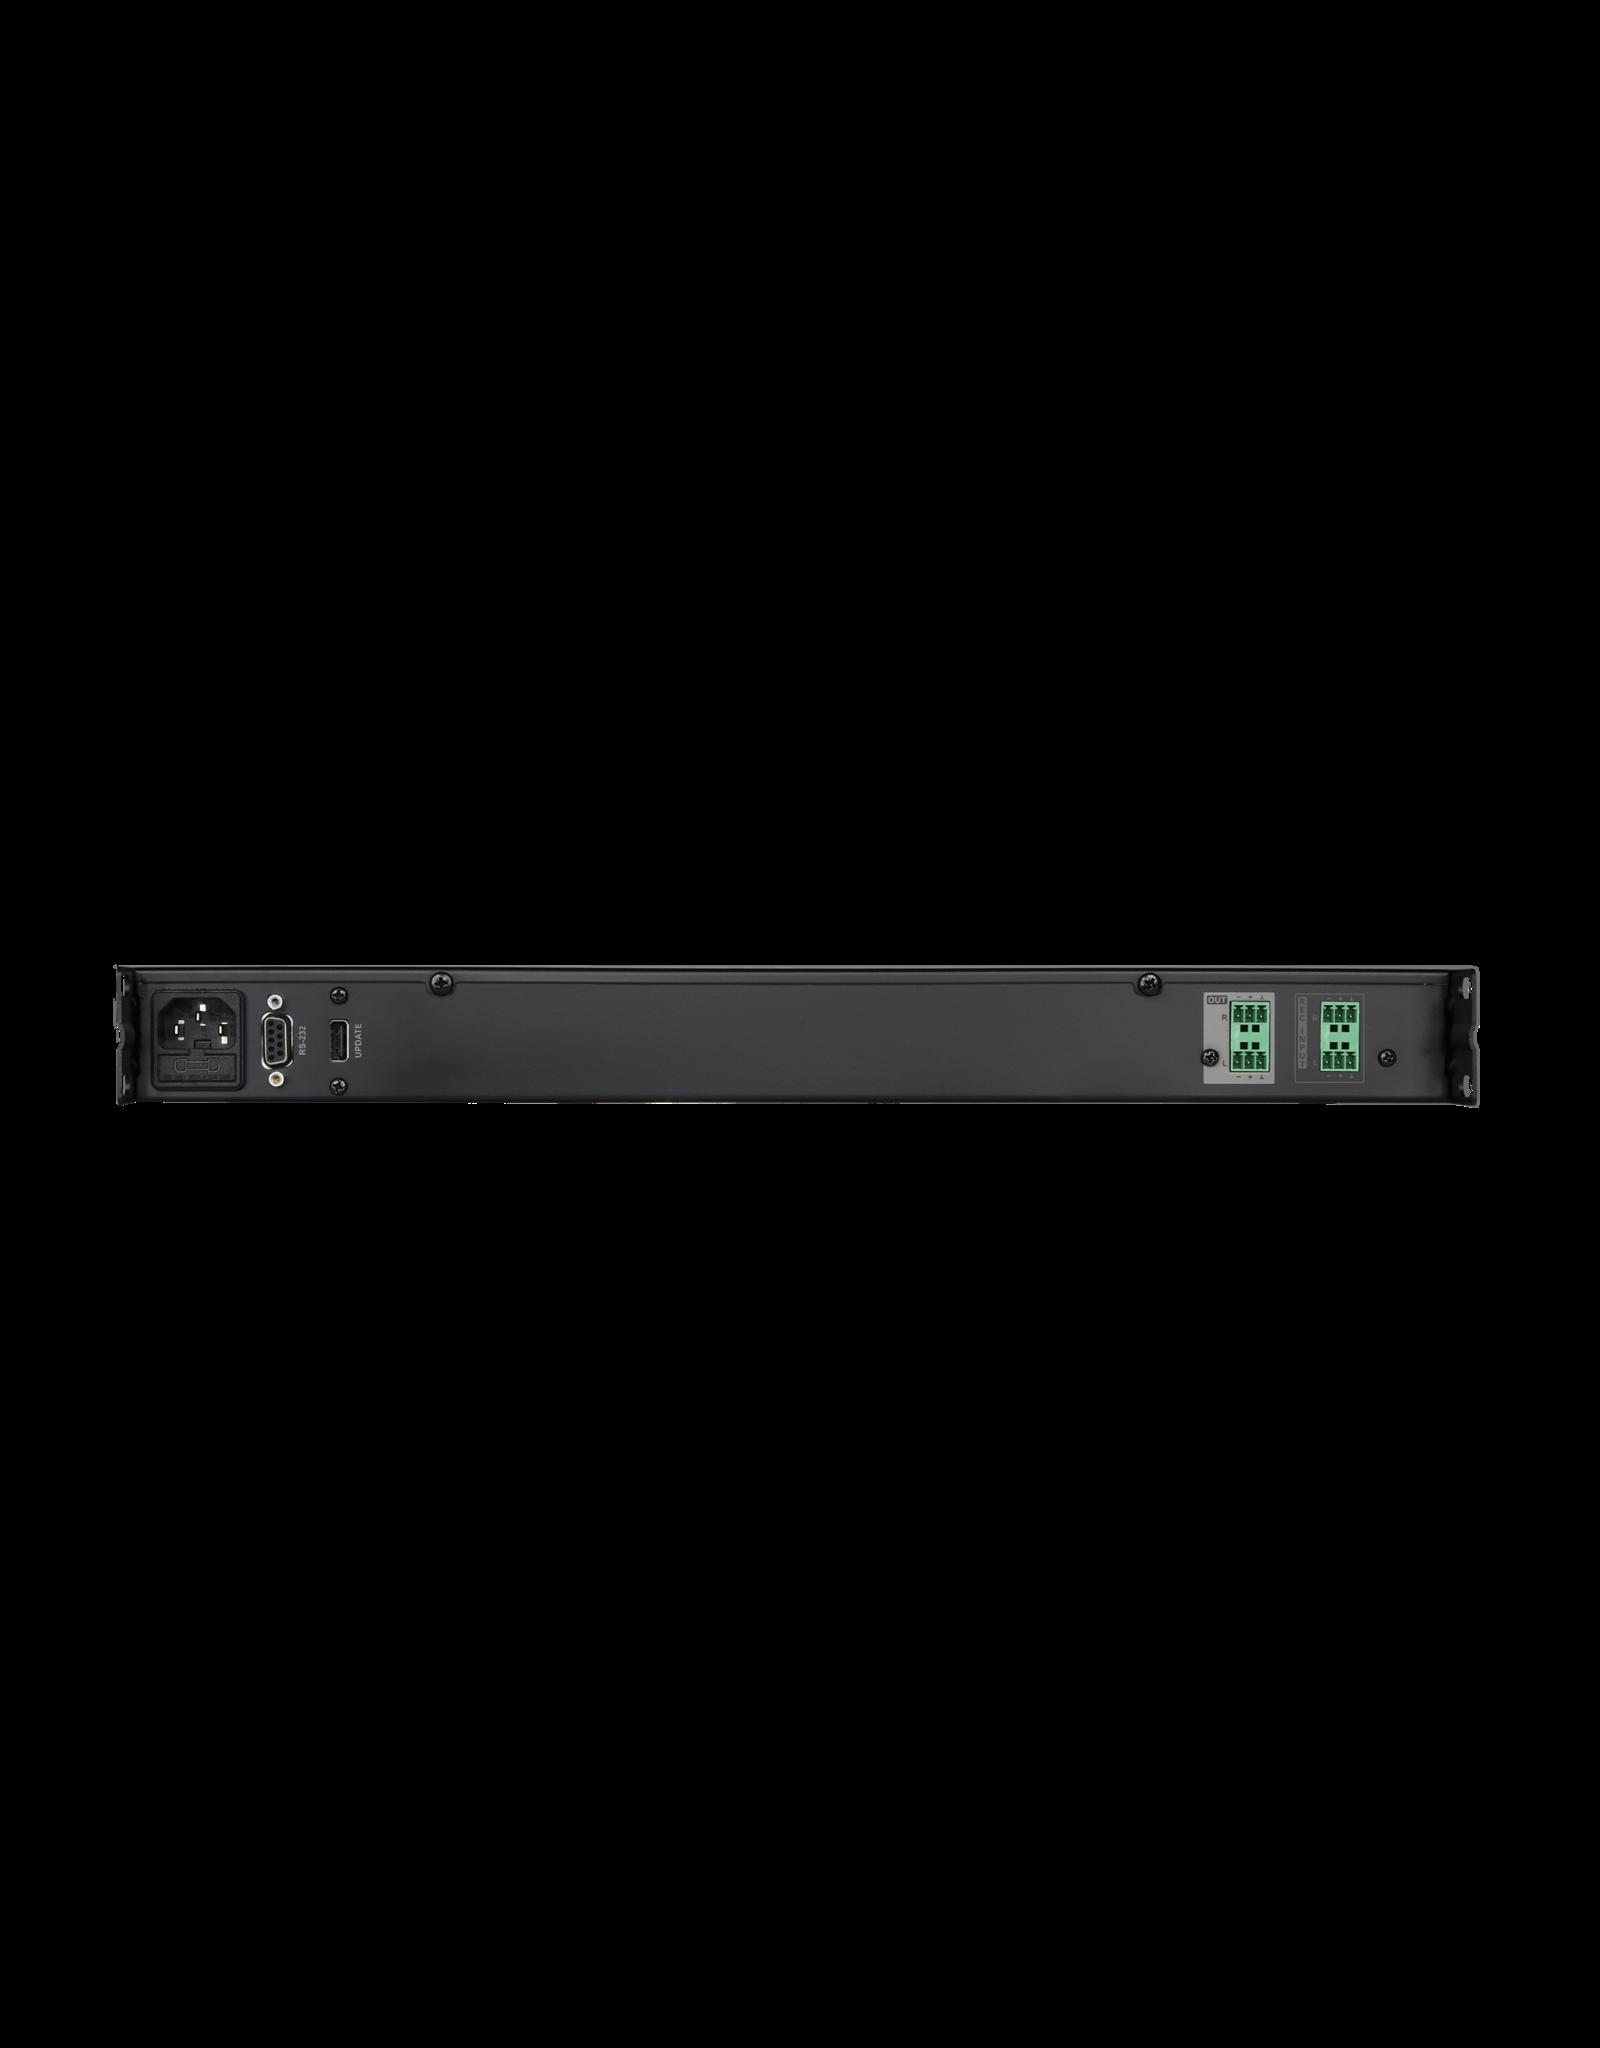 Audac Media player / recorder